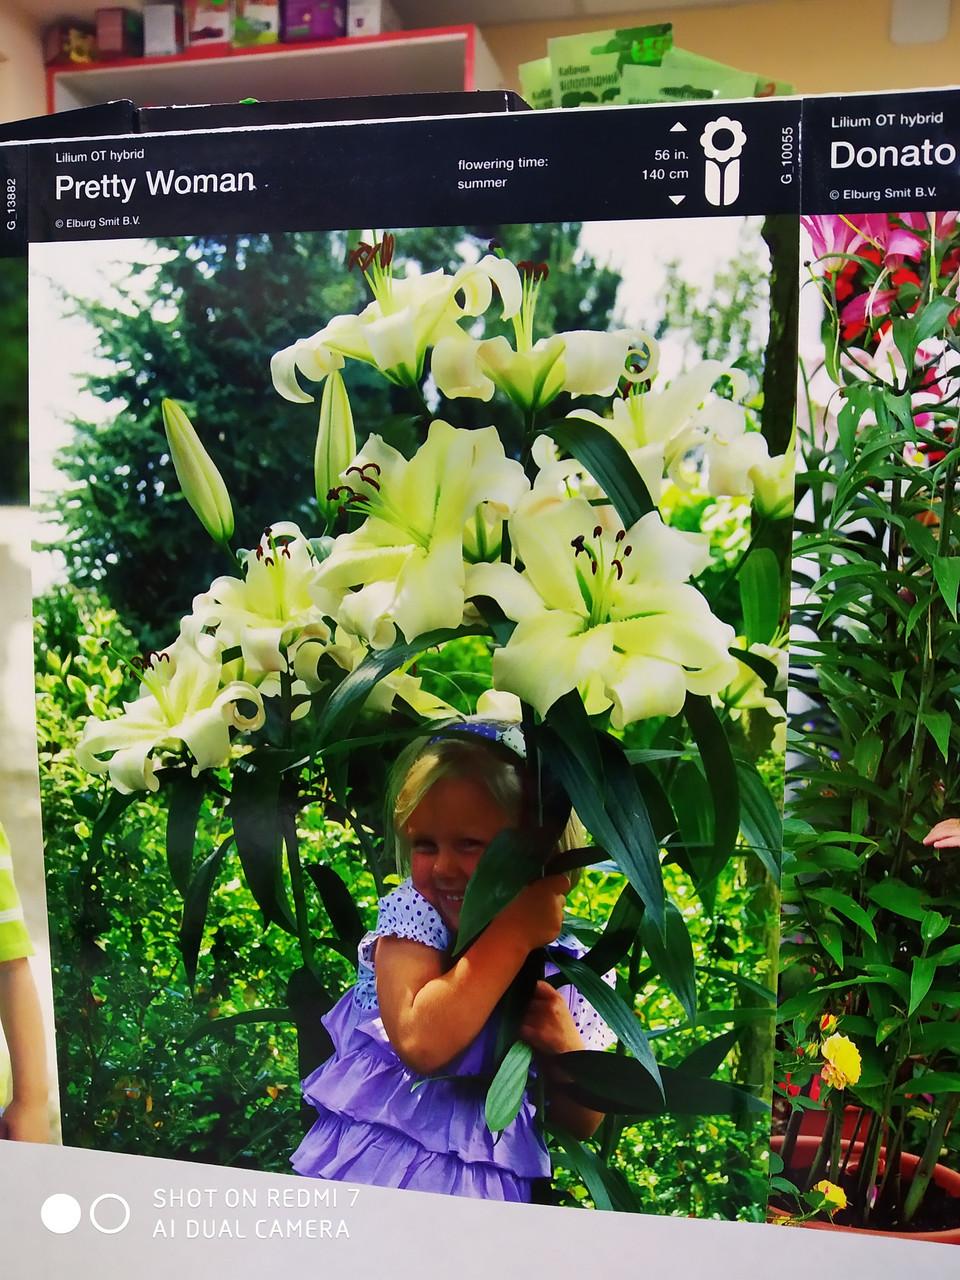 Луковица лилии ОТ-гибрид белая Pretty Woman 1 шт Junior Голландия